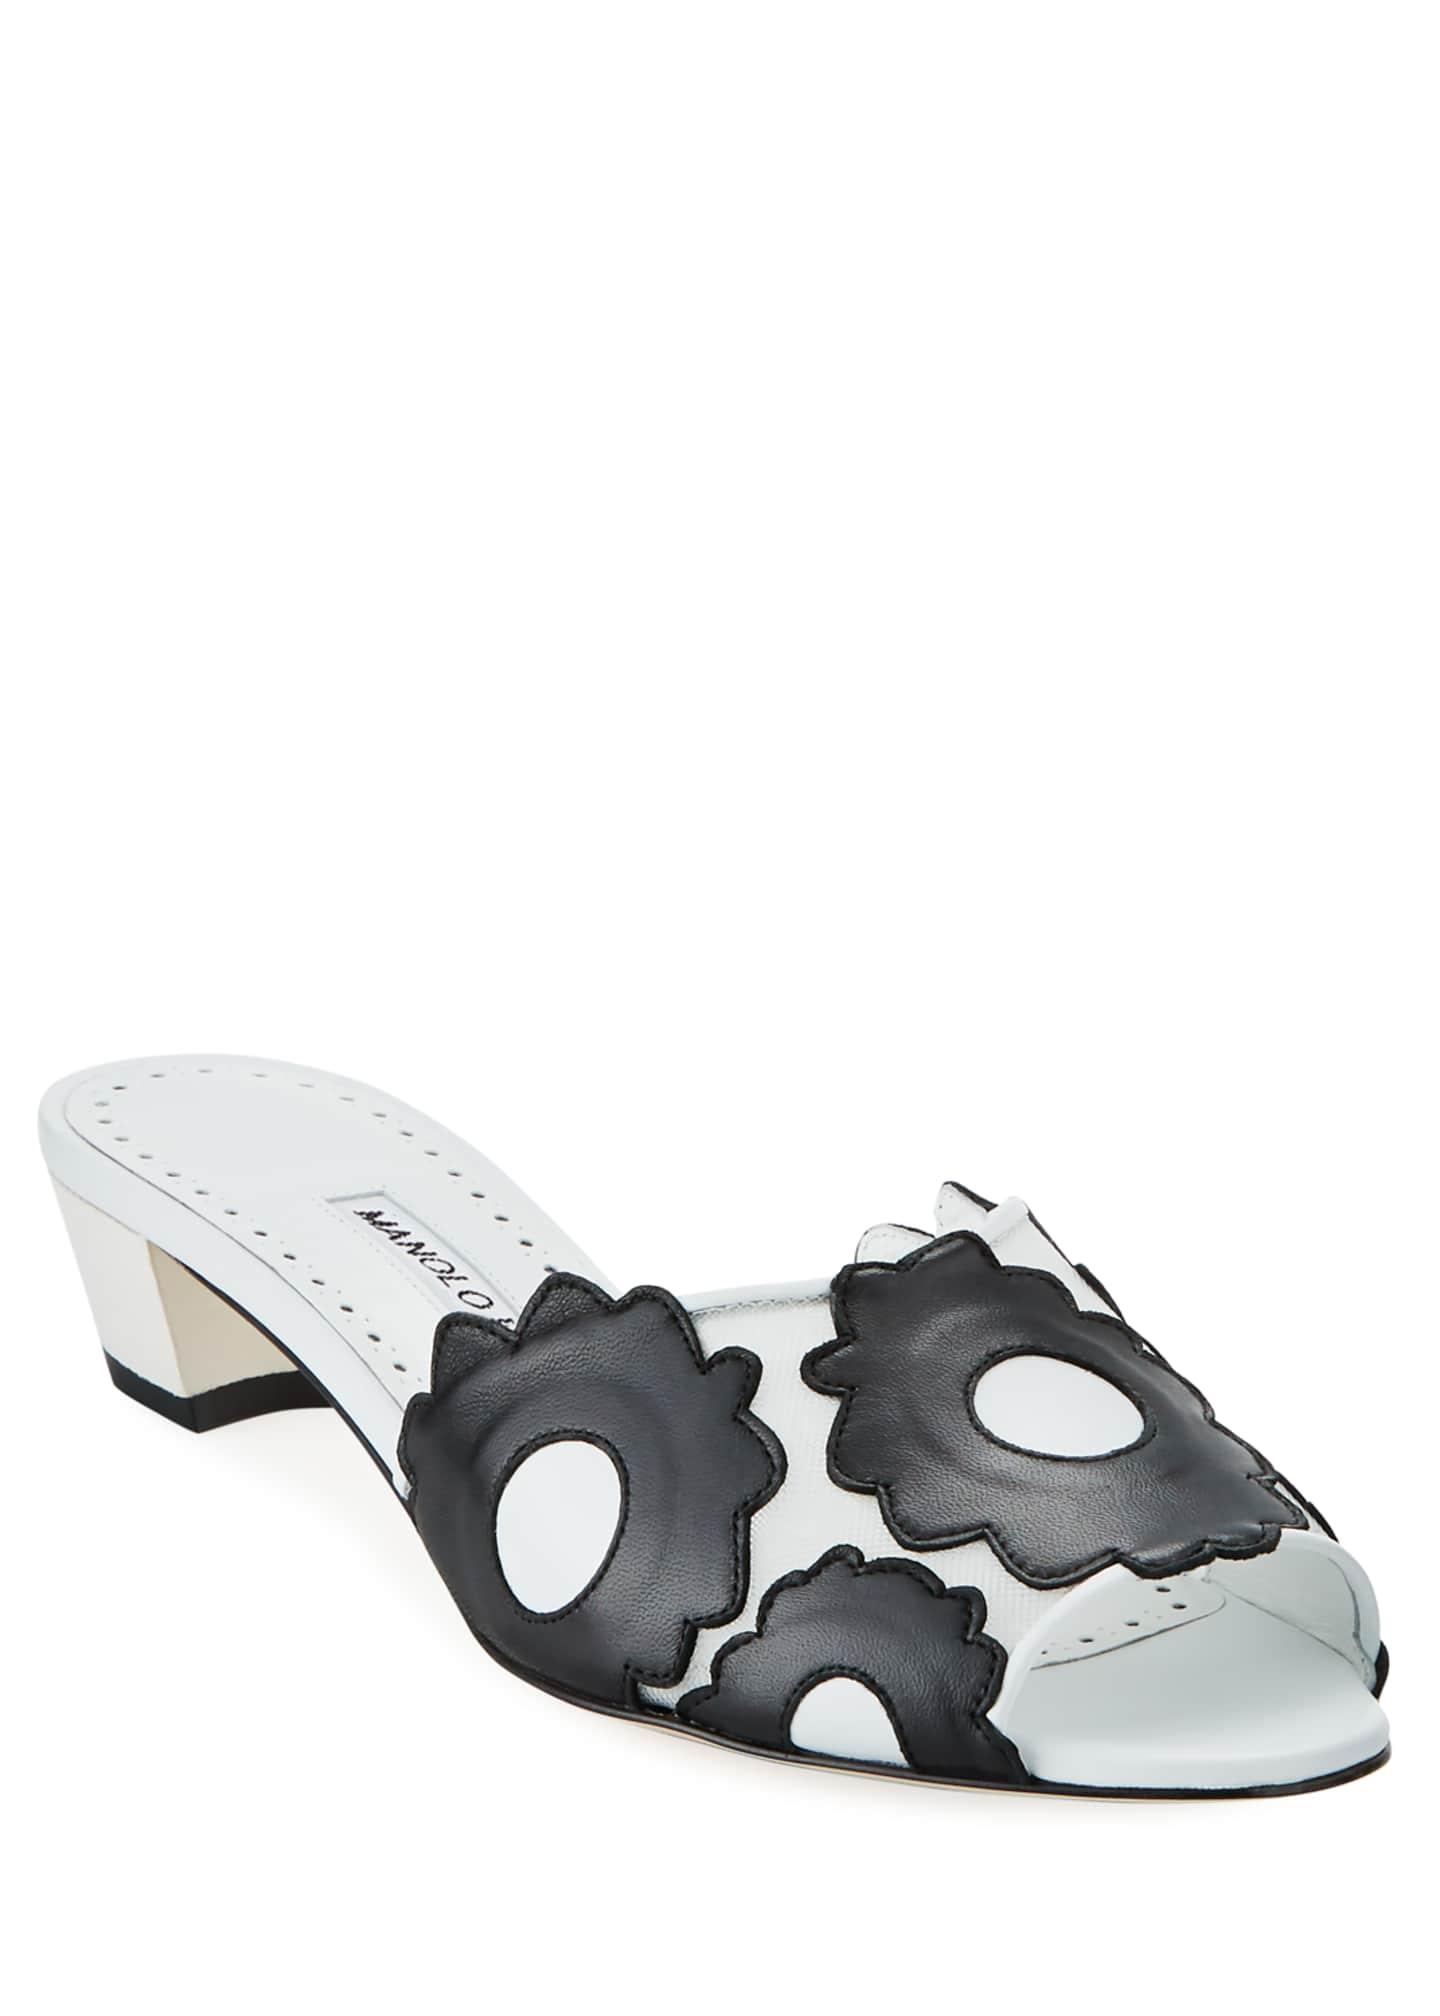 Manolo Blahnik Lottara 30mm Slide Sandals with Flowers